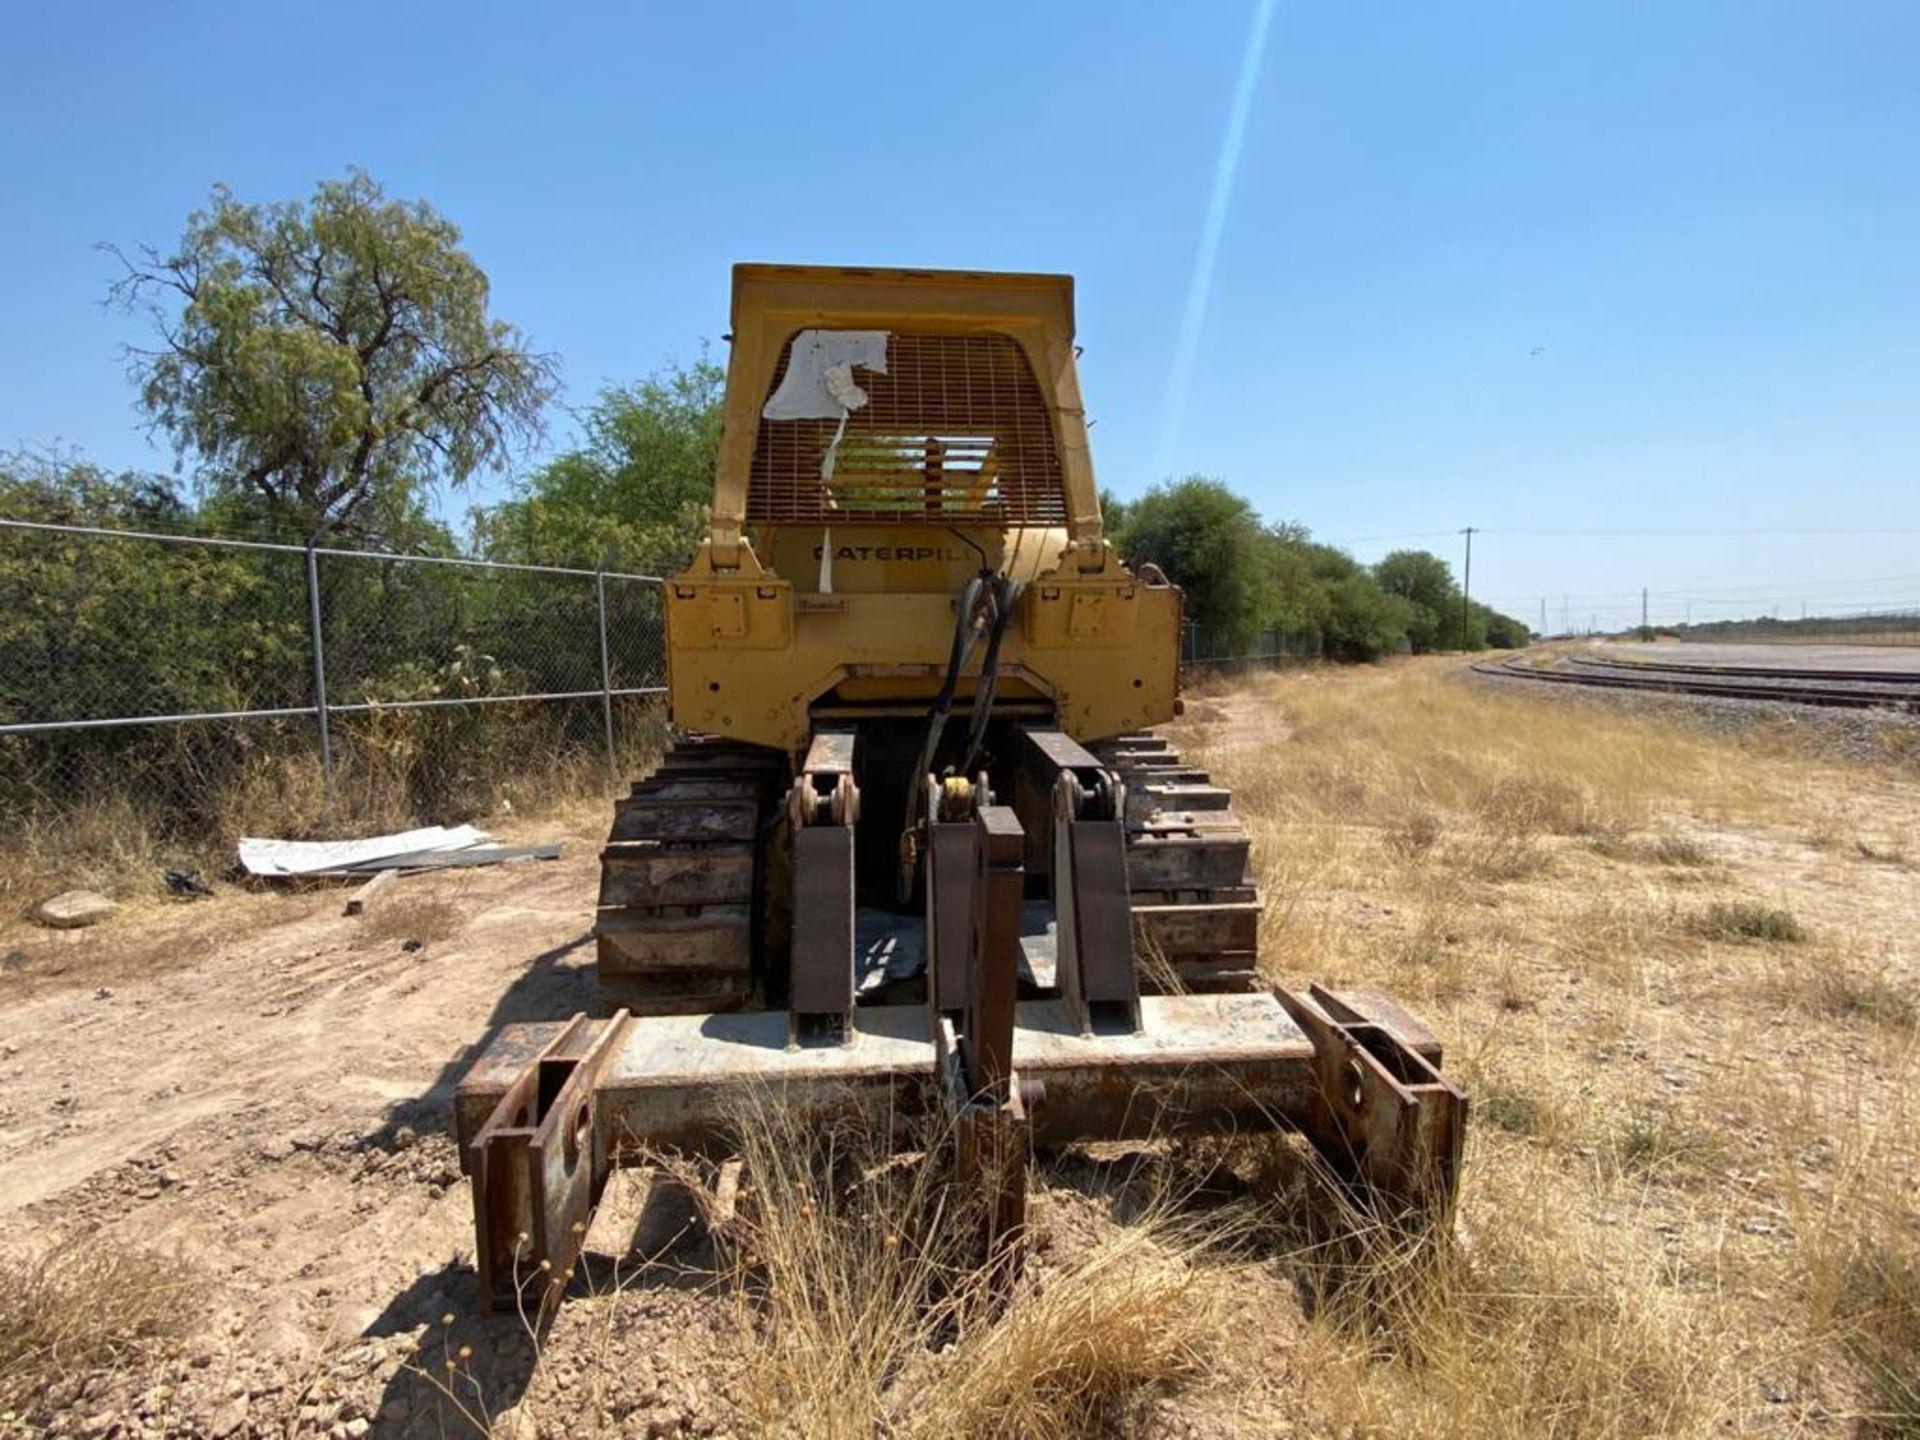 Caterpillar D7G Bulldozer, Serial number 92V5897, Diesel motor - Image 11 of 48